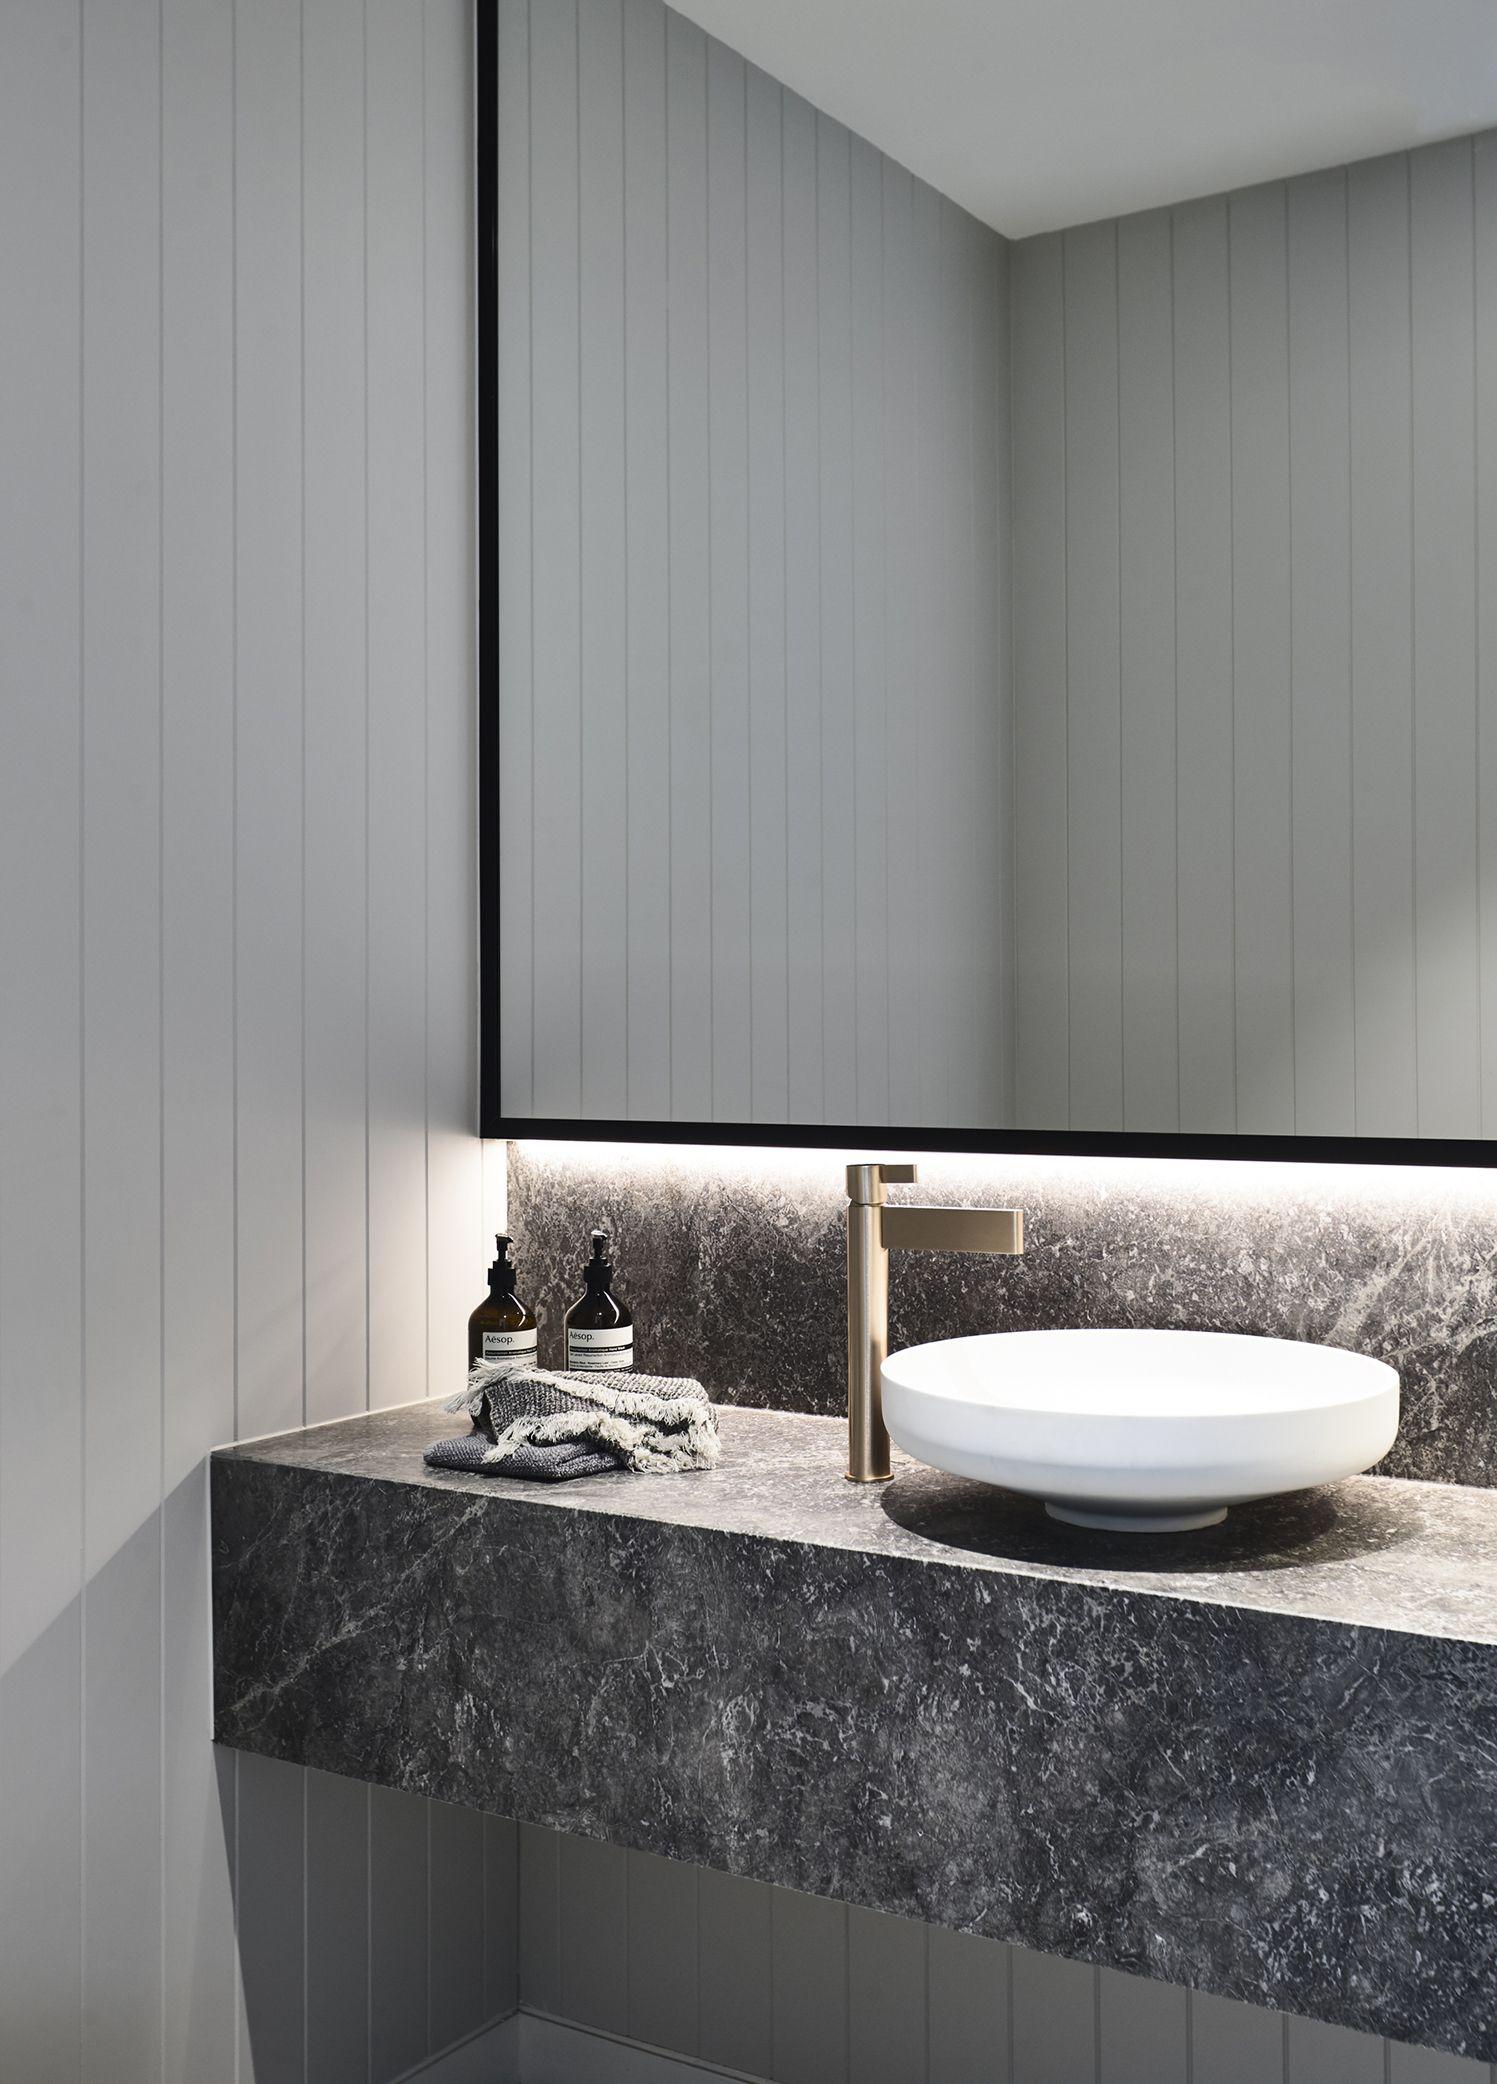 Lubelso New Concept Home Contemporary Design Bathroom Trends Bathroom Decor Modern Bathroom